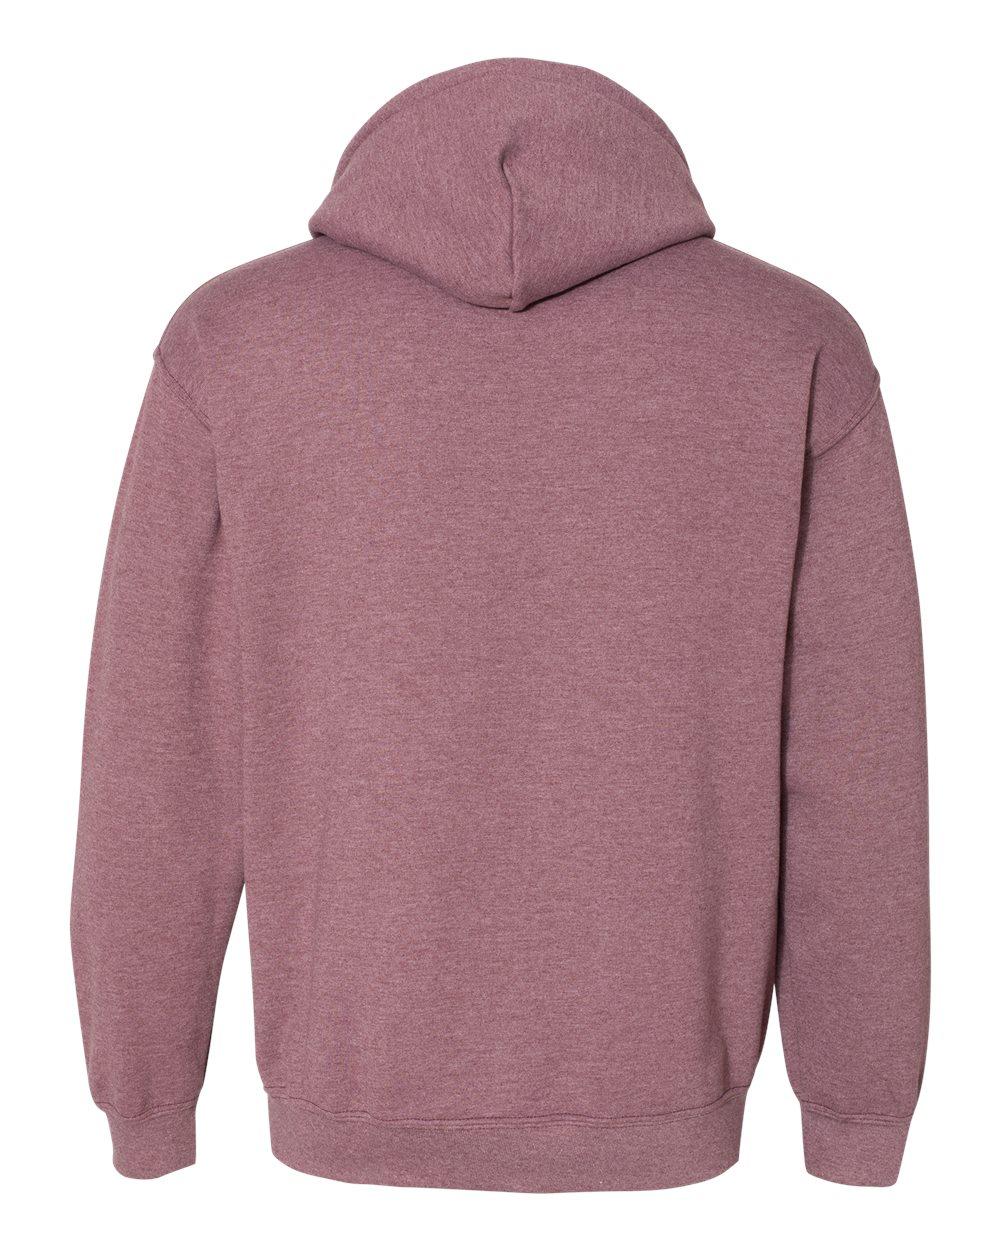 Gildan-Mens-Blank-Hoodie-Heavy-Blend-Hooded-Sweatshirt-18500-up-to-5XL thumbnail 25